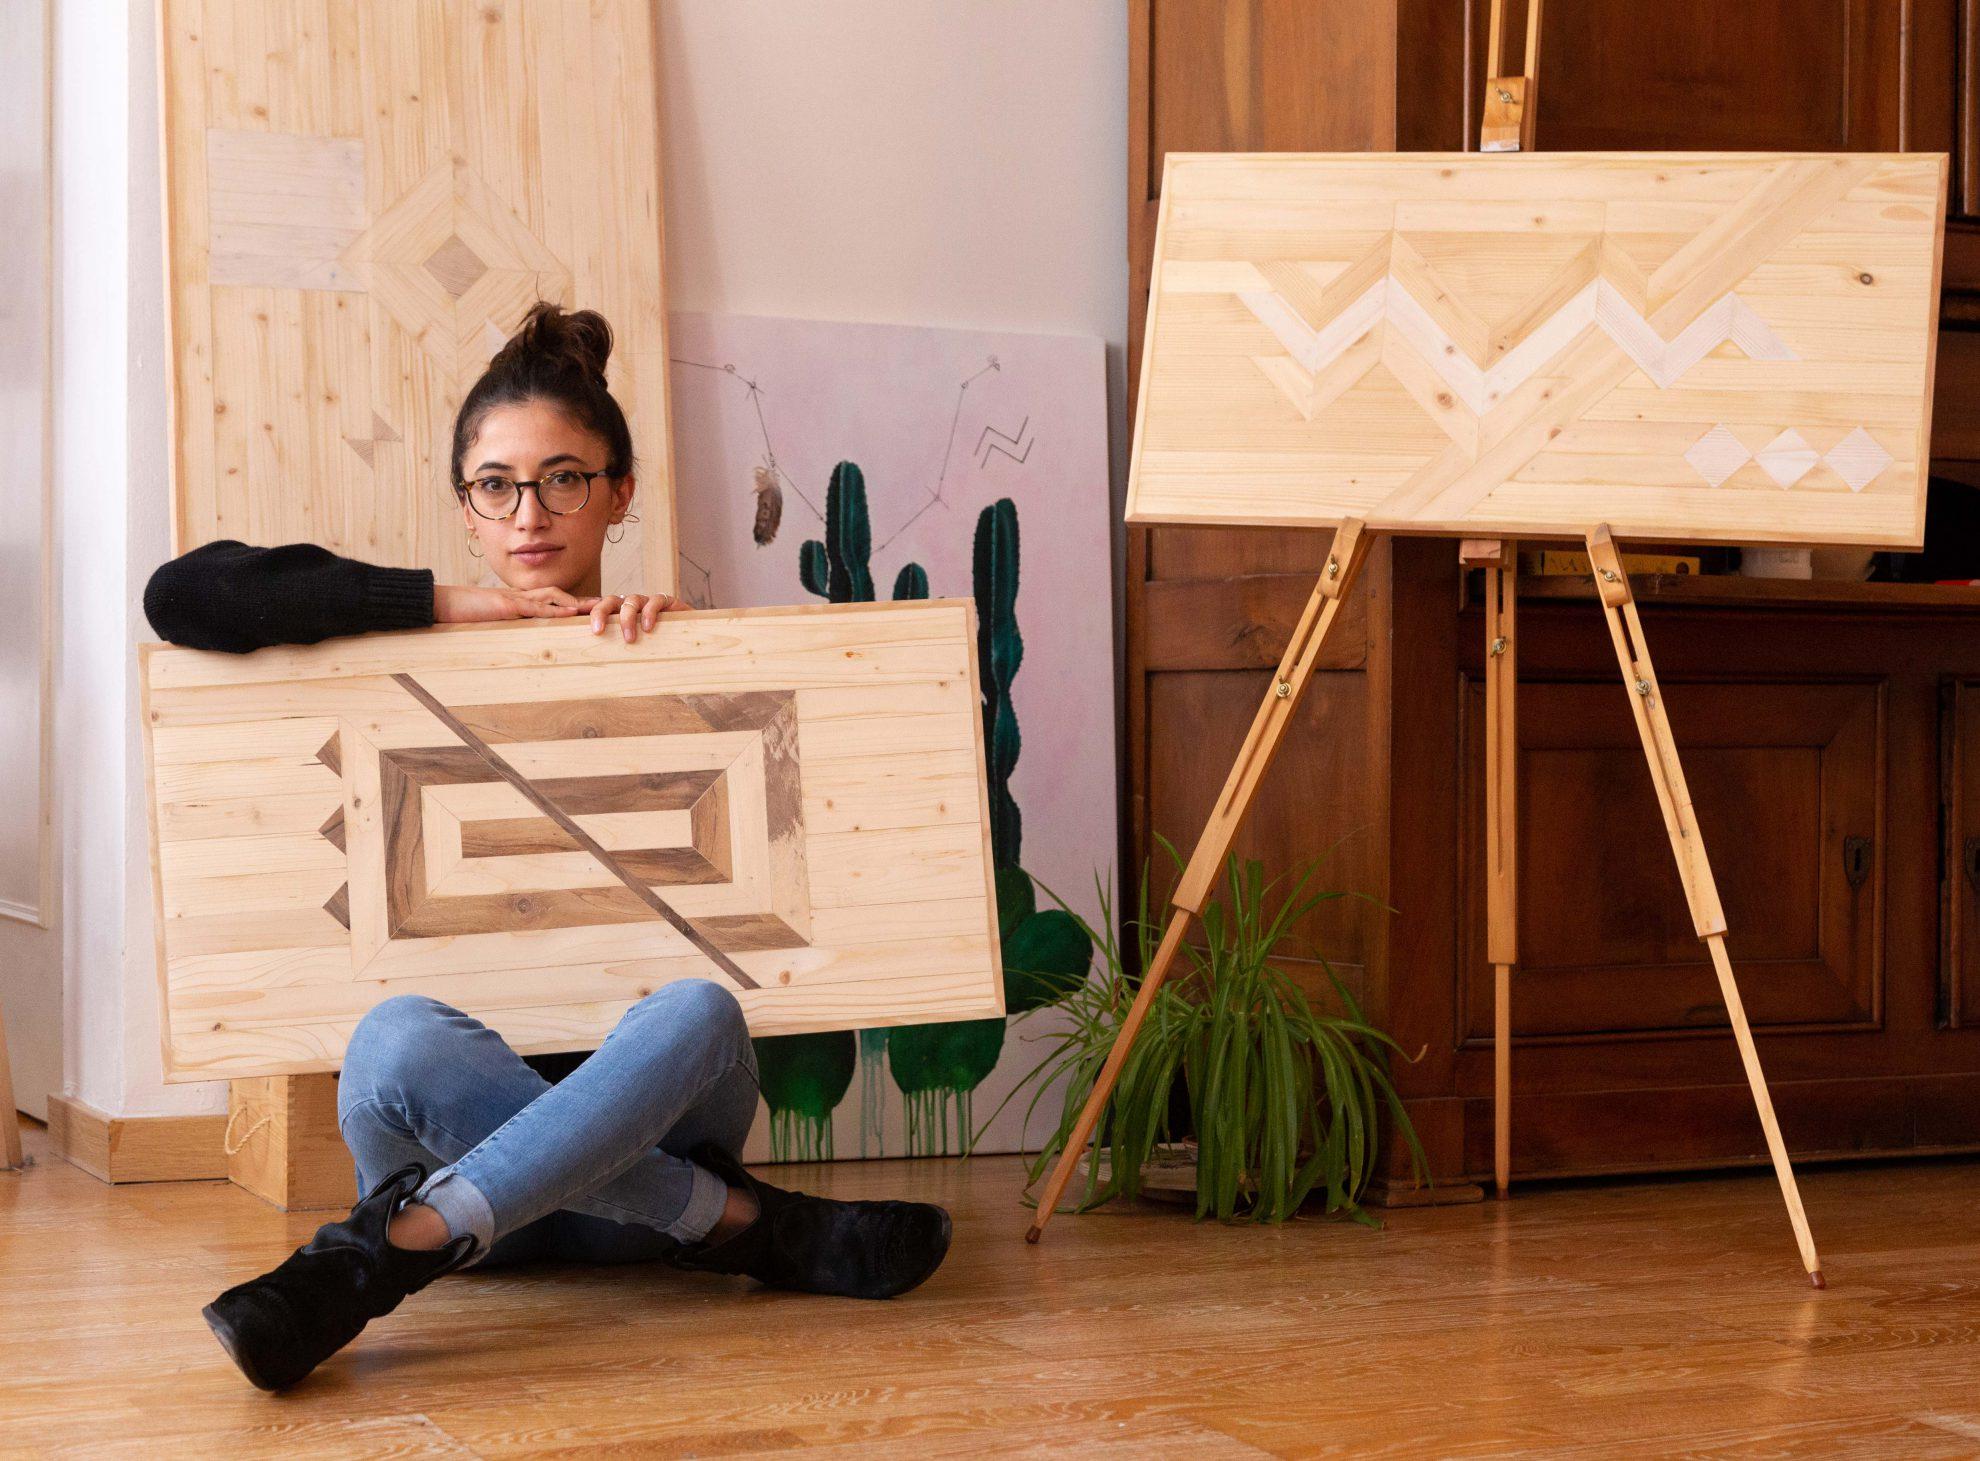 Elisa Bosco and her wooden wall art